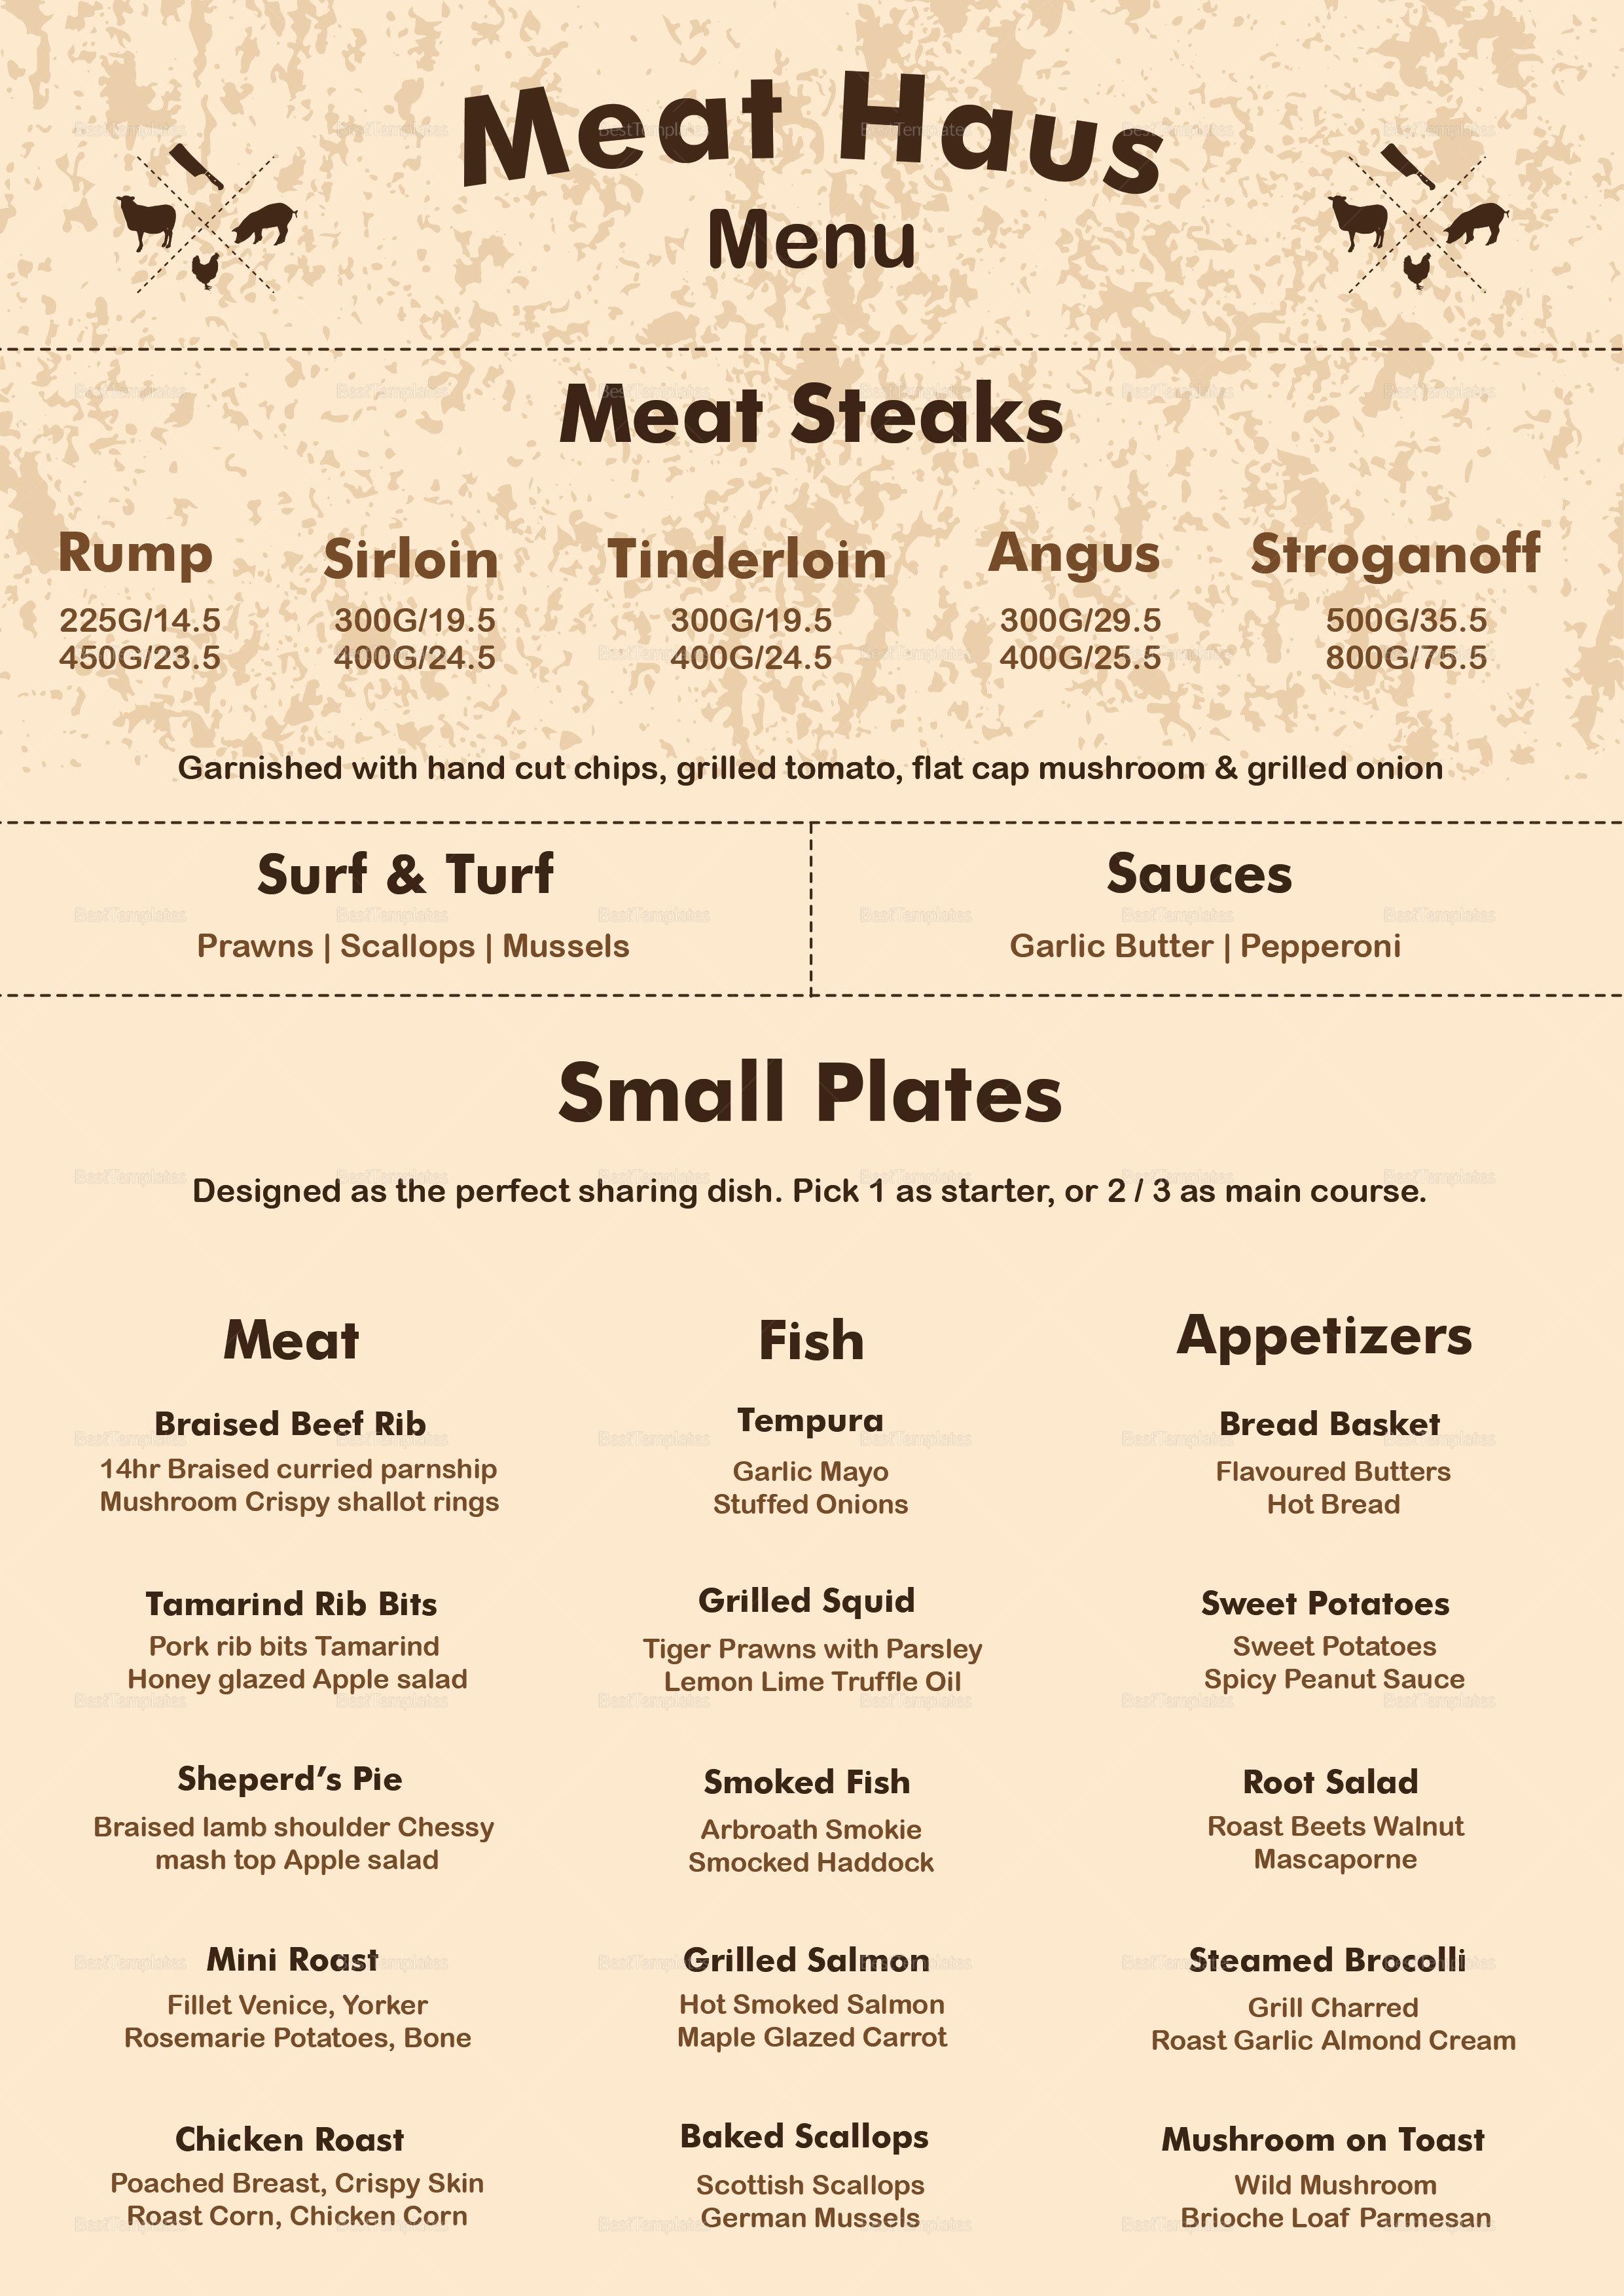 Meat Menu Template